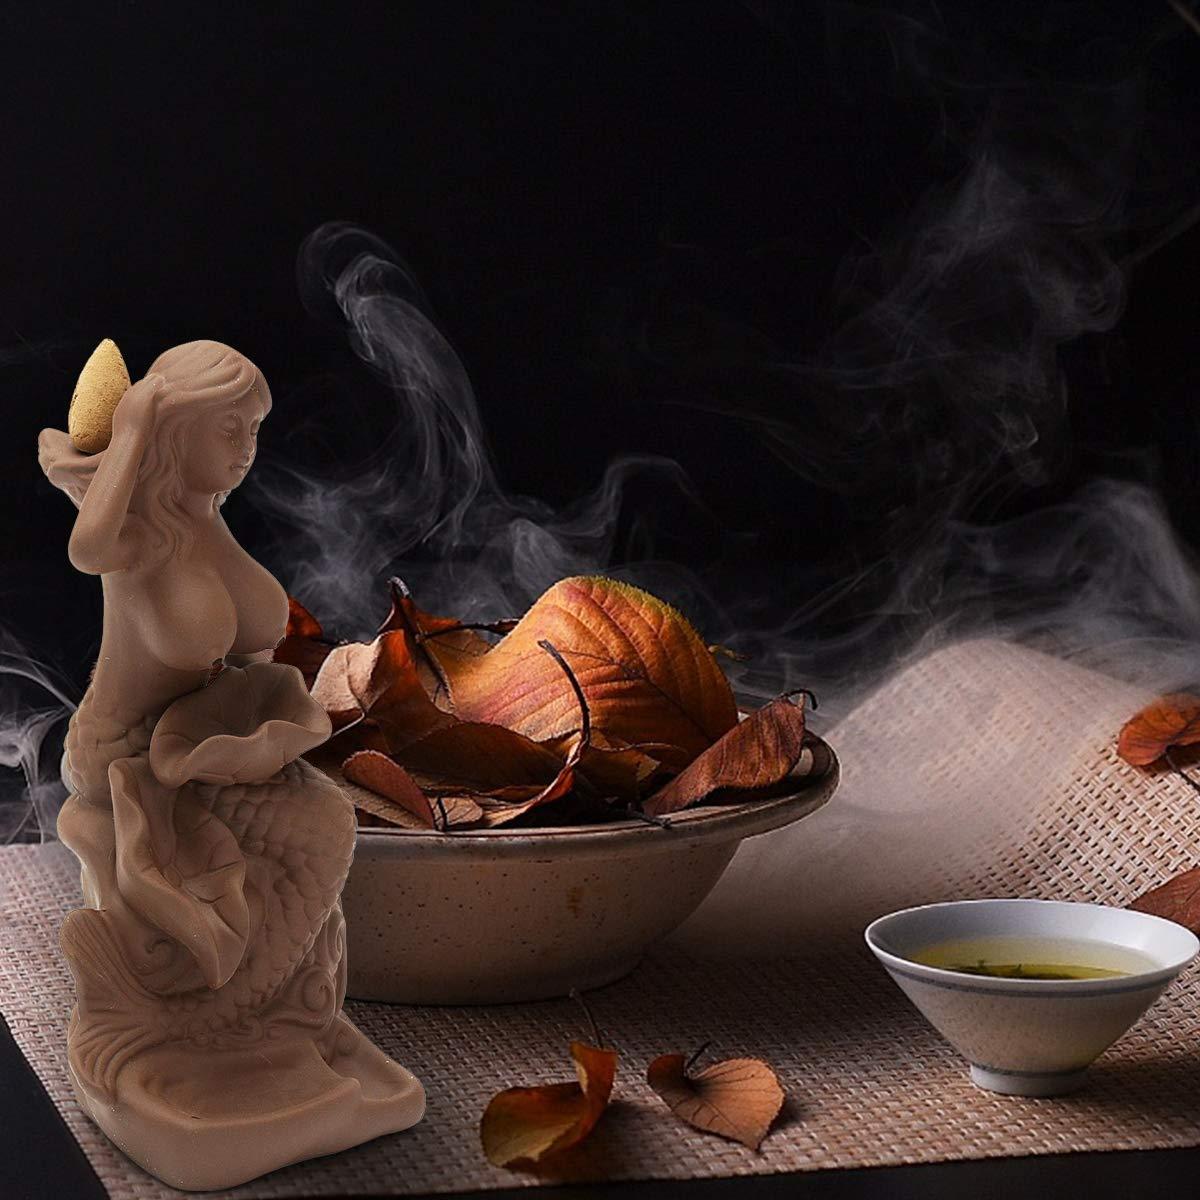 Jeteven Keramik Räucherstäbchenhalter Rückfluss Räuchergefäß Luftbefeuchter für Freies Kegel \'\'Meerjungfrau\'\' Aromatherapie Räucherstäbchen Rückfluss Weihrauch (8 x 7 x 17.5 cm)